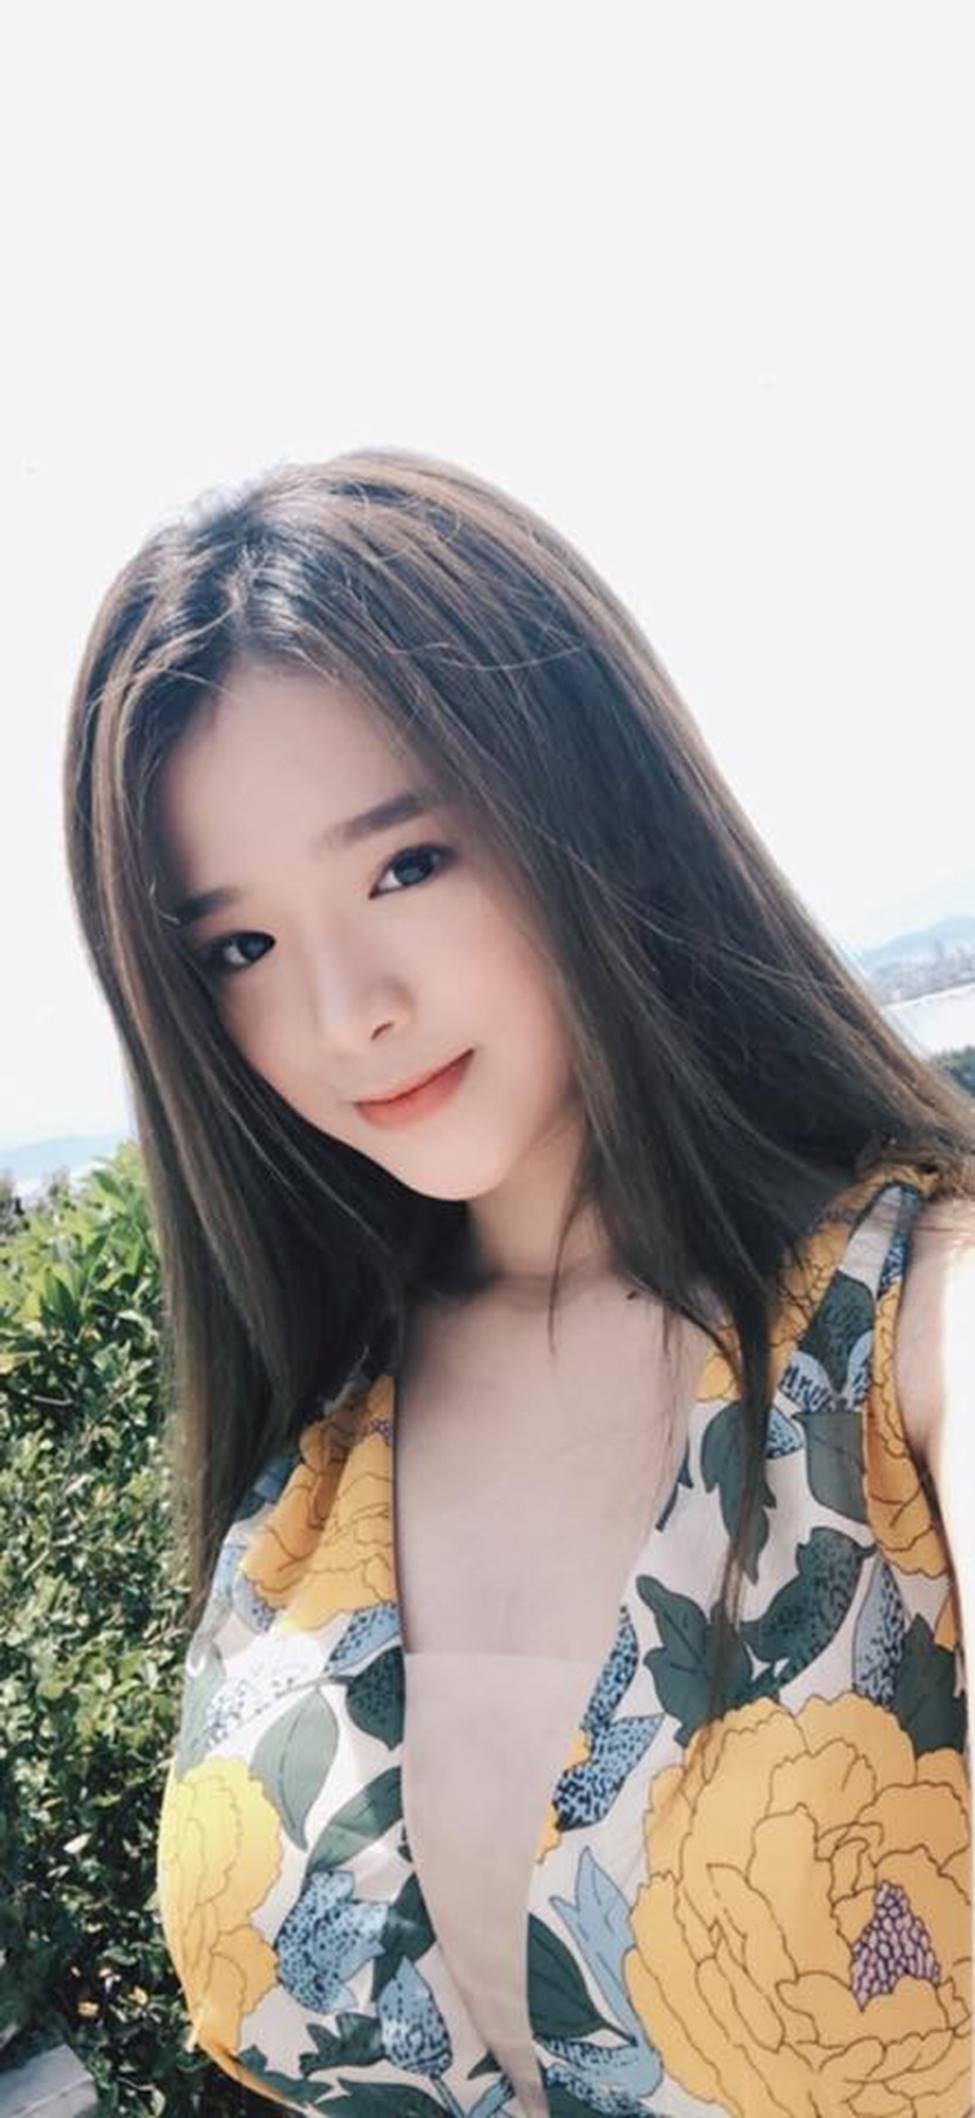 Hot girl Linh Ka phổng phao bất ngờ ở tuổi 16-4